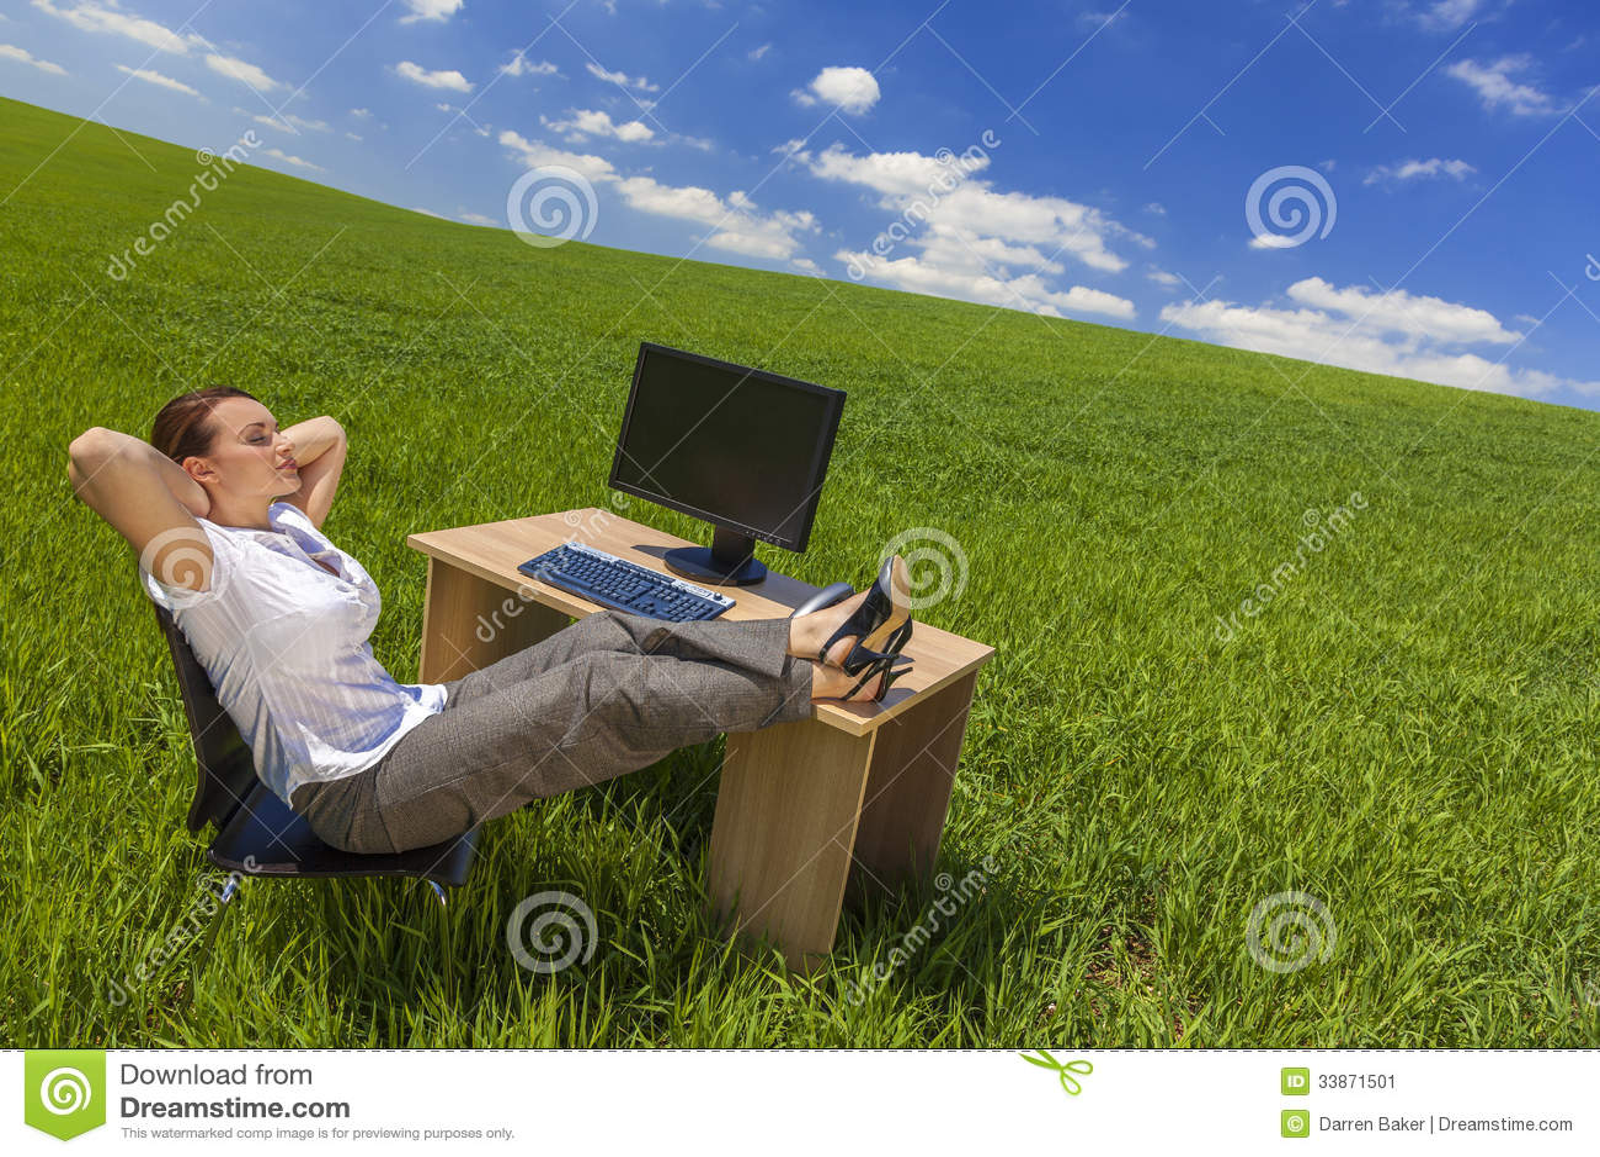 Businesswoman Woman Relaxing at Desk In Green Field